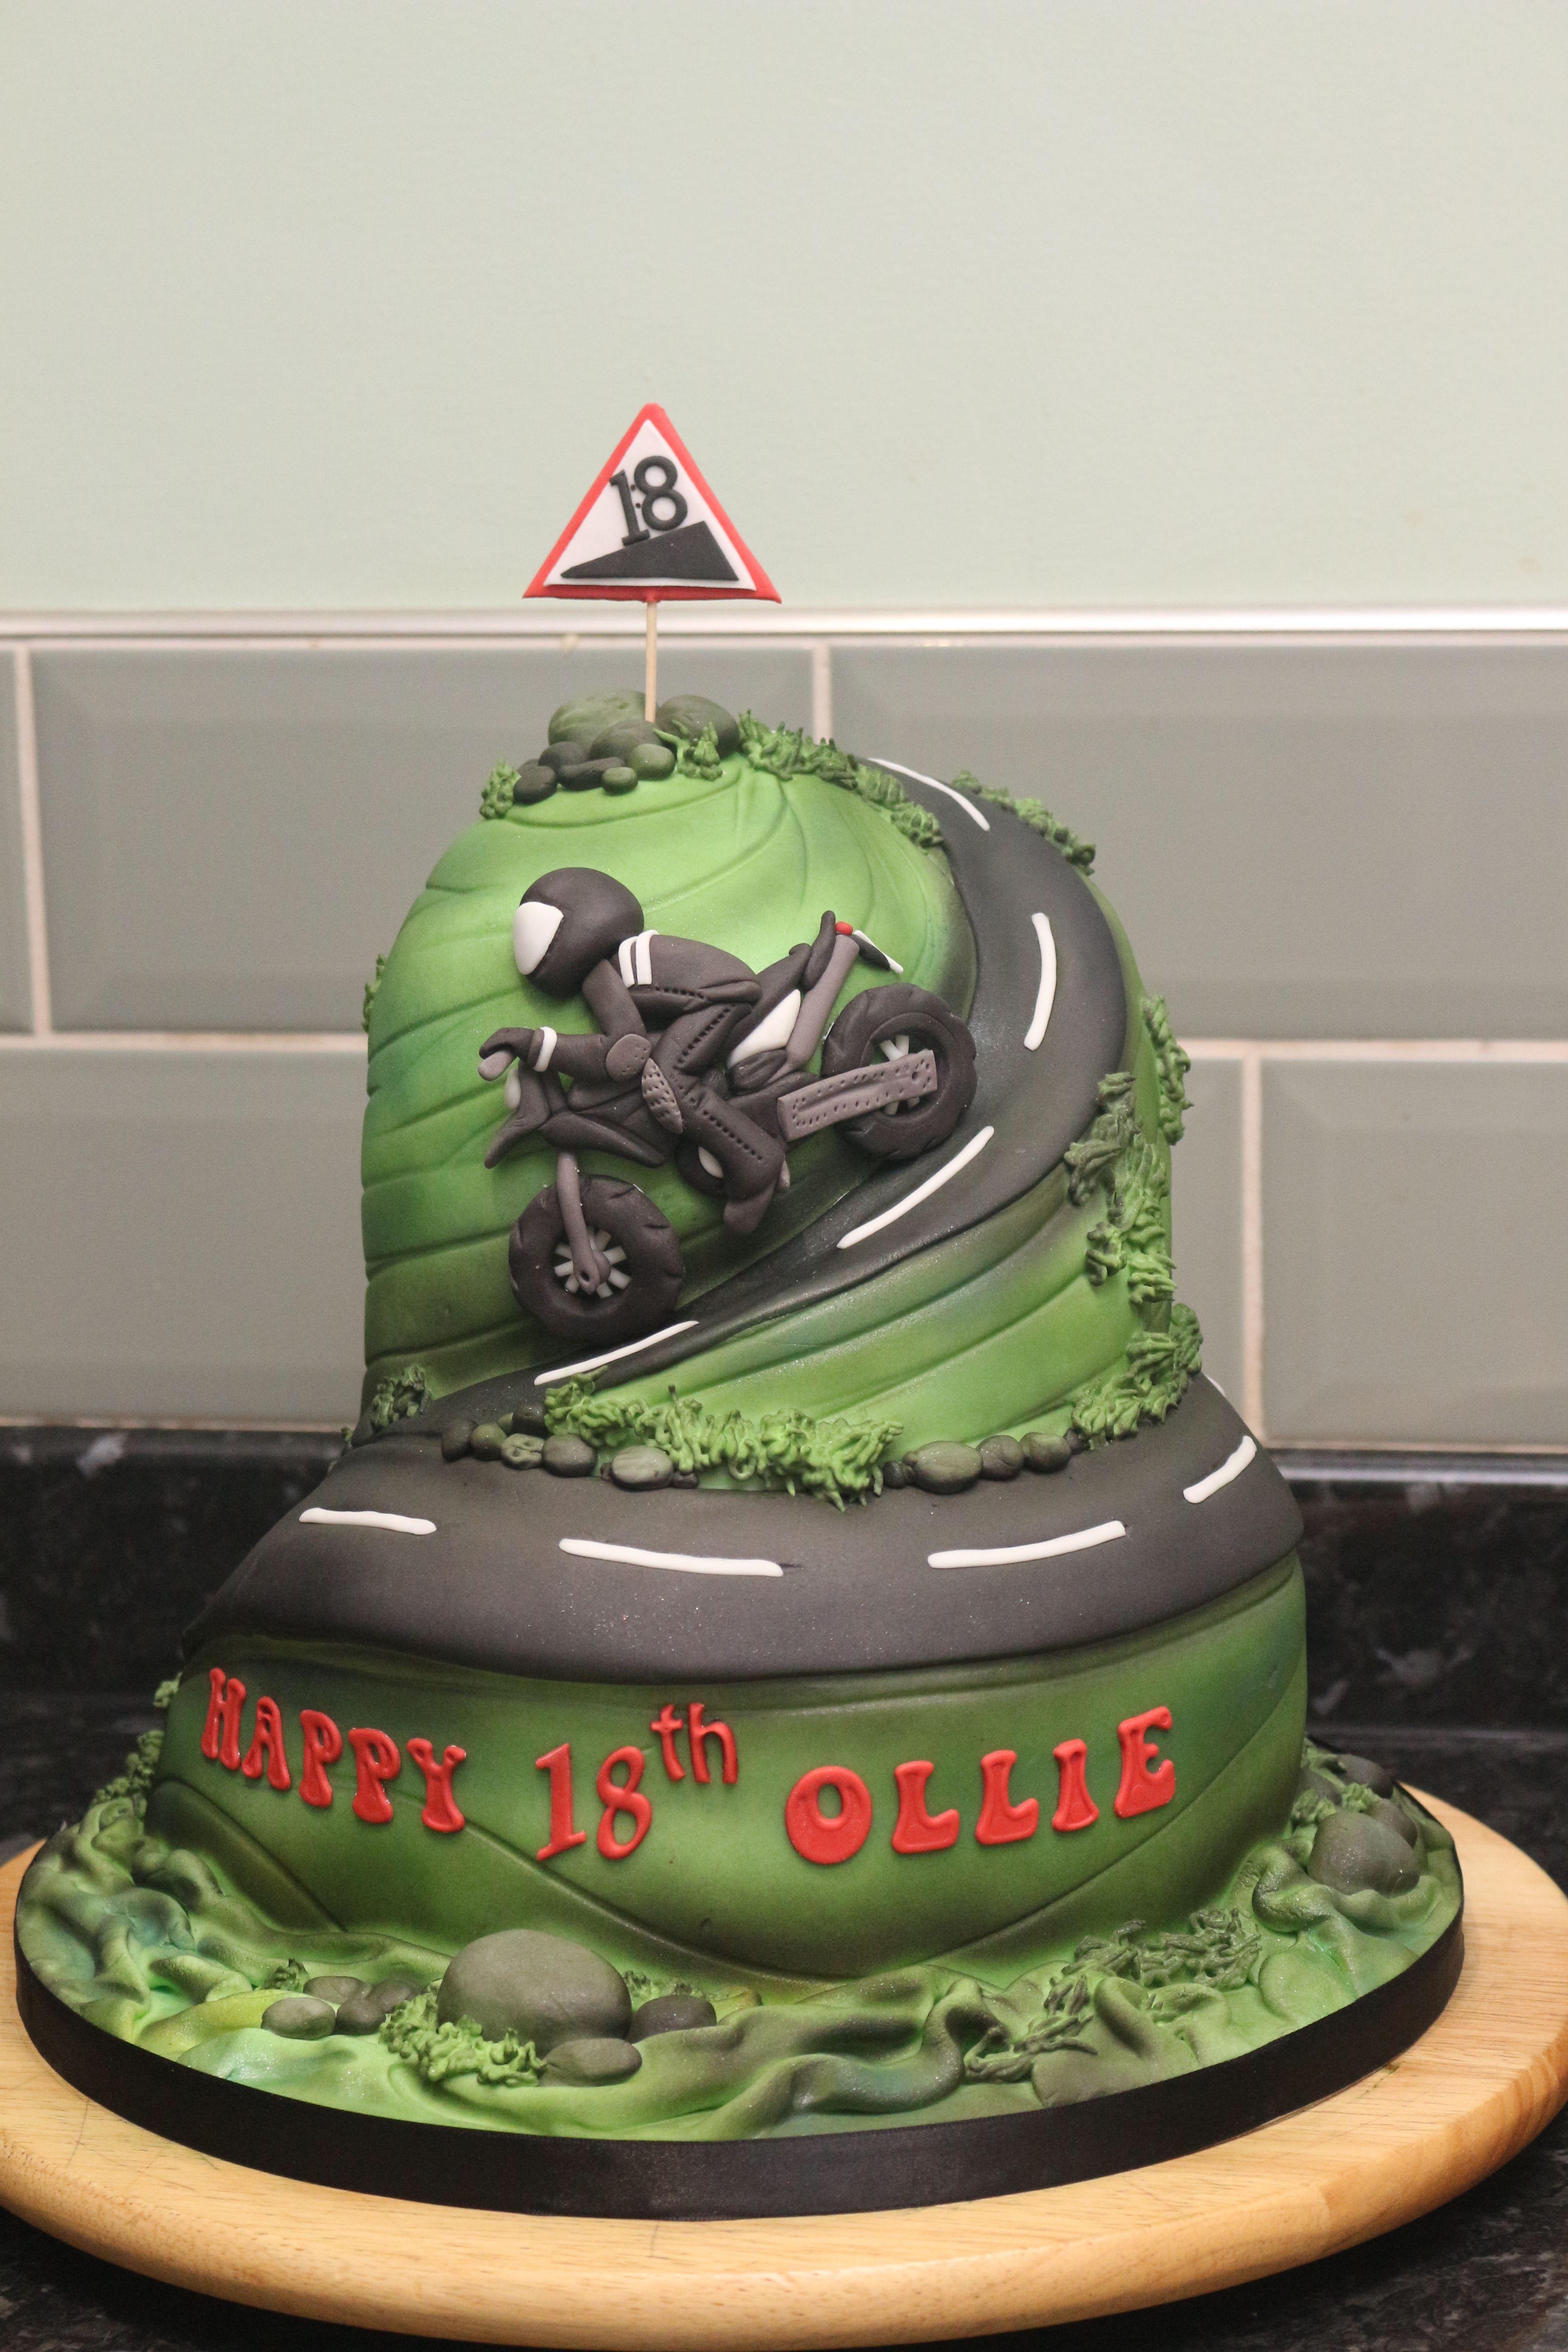 Motorbike Cake Bday Party